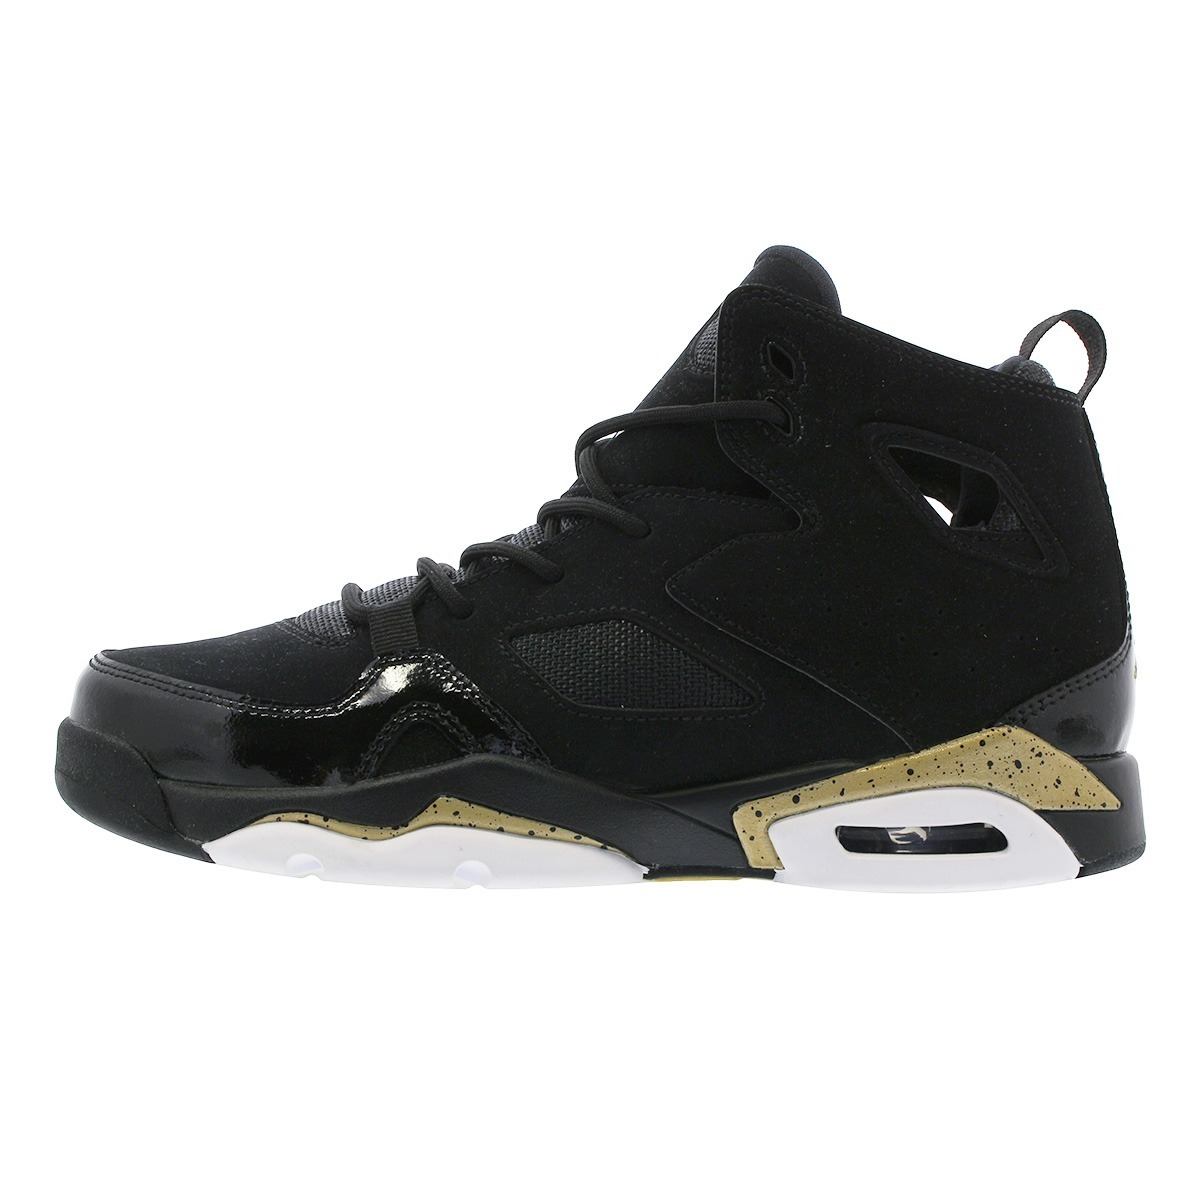 lowest price 669c3 b58fe Tenis Jordan Flight Club 91 Negro Dorado Bota Basket Retro